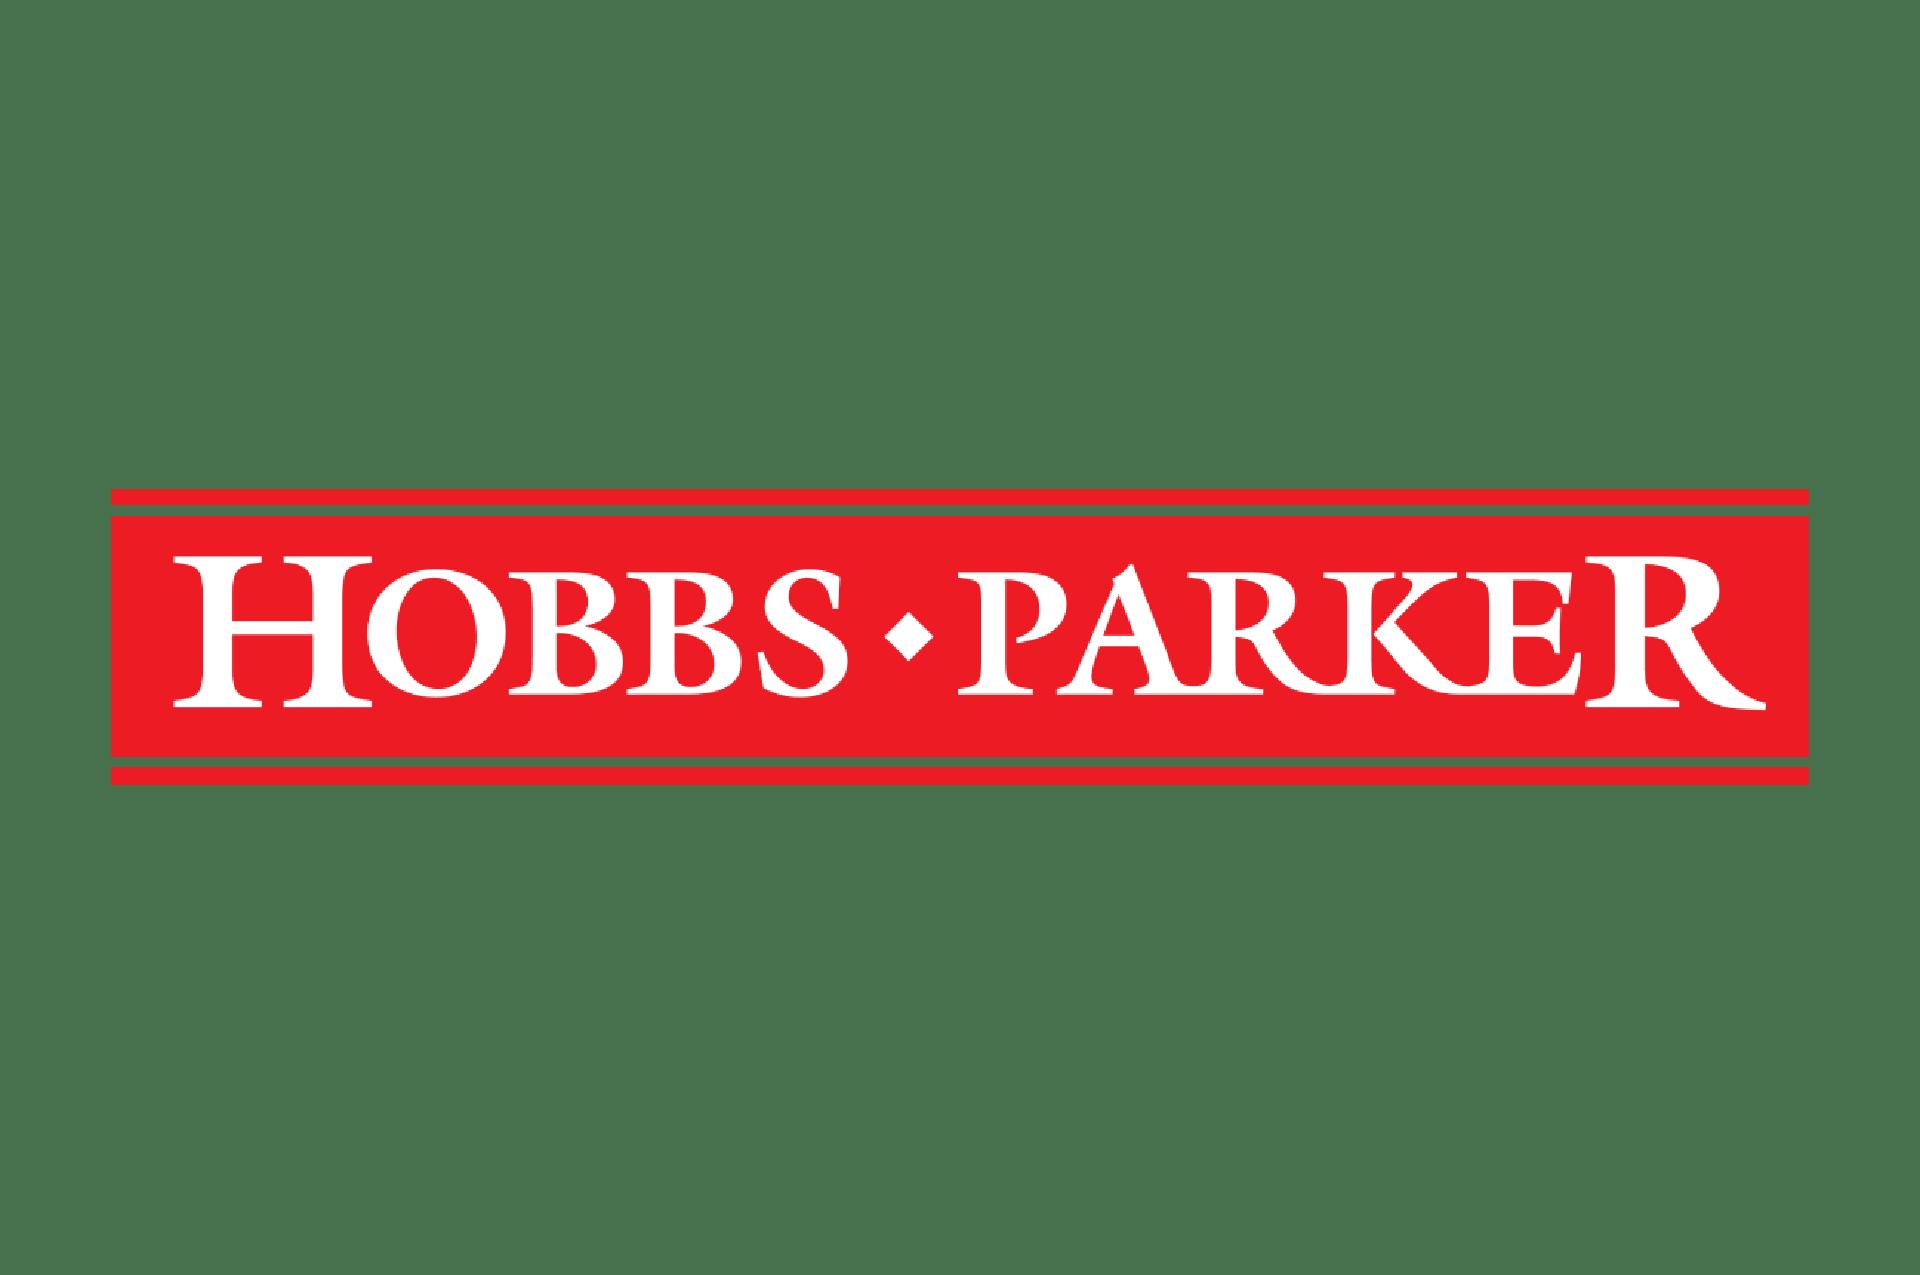 Hobbs Parker logo